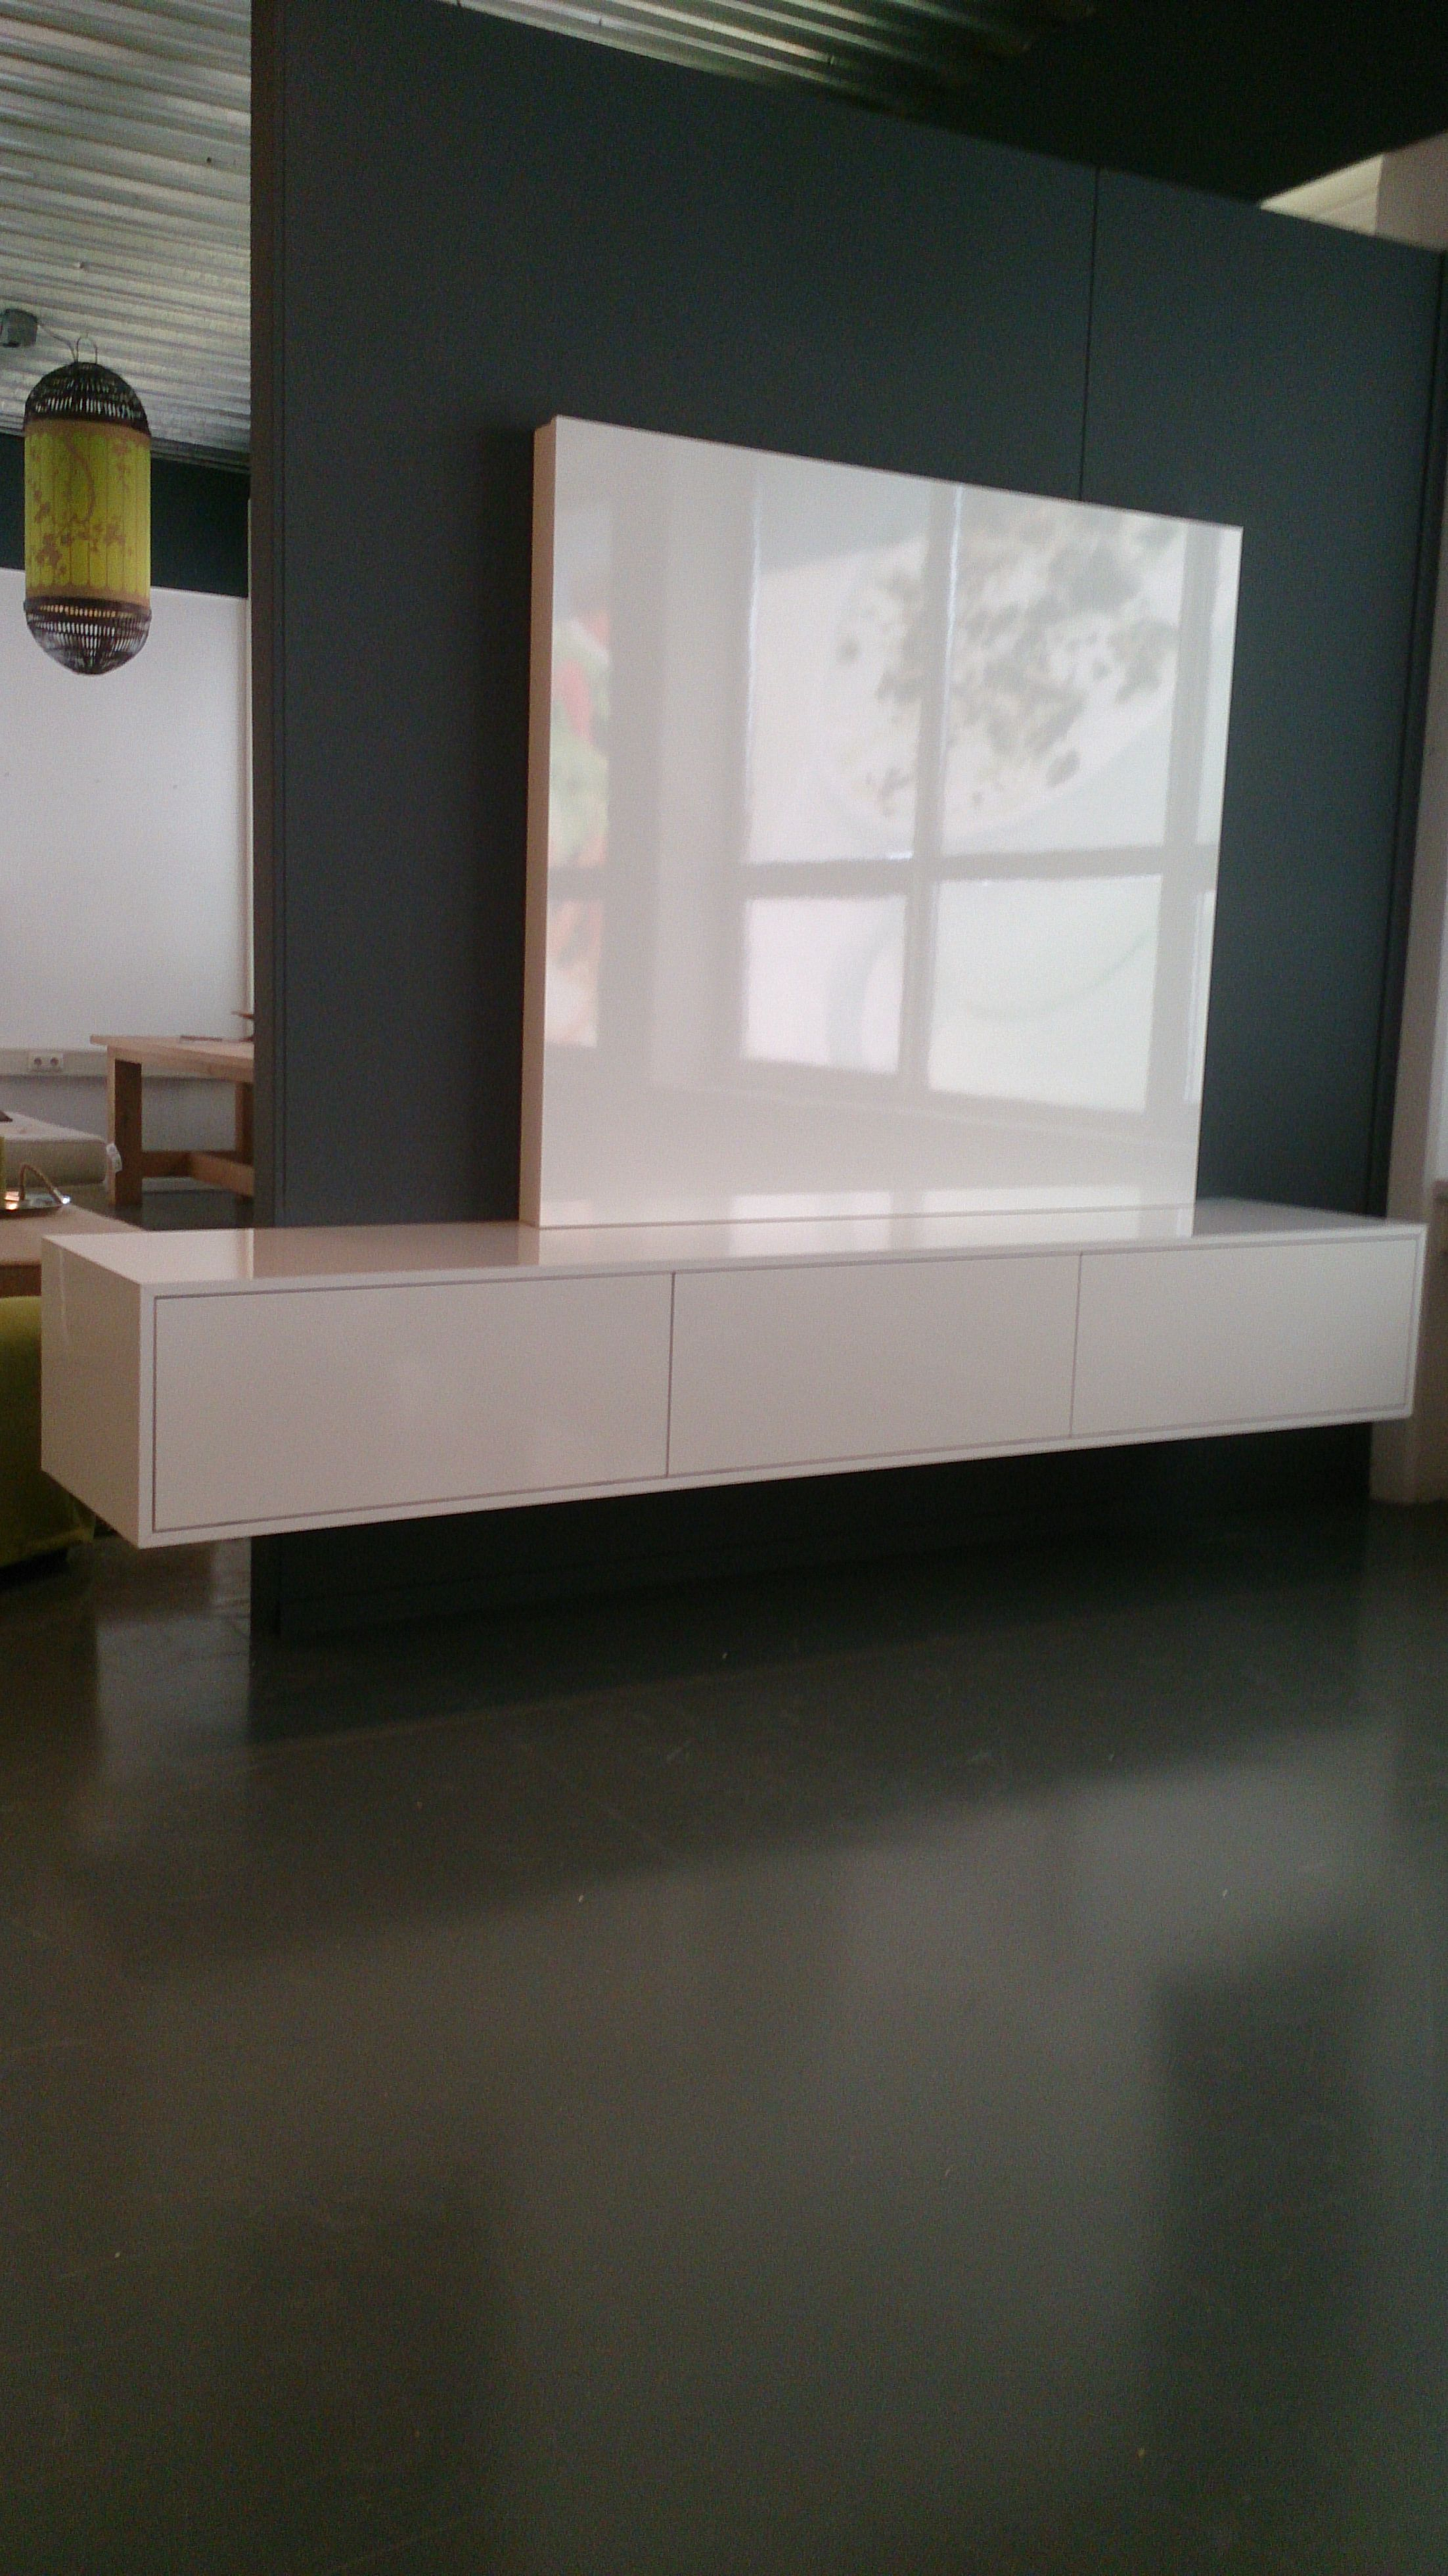 Verbazingwekkend Tv meubel met flatscreen achterwand, hoogglans wit. (met AH-91